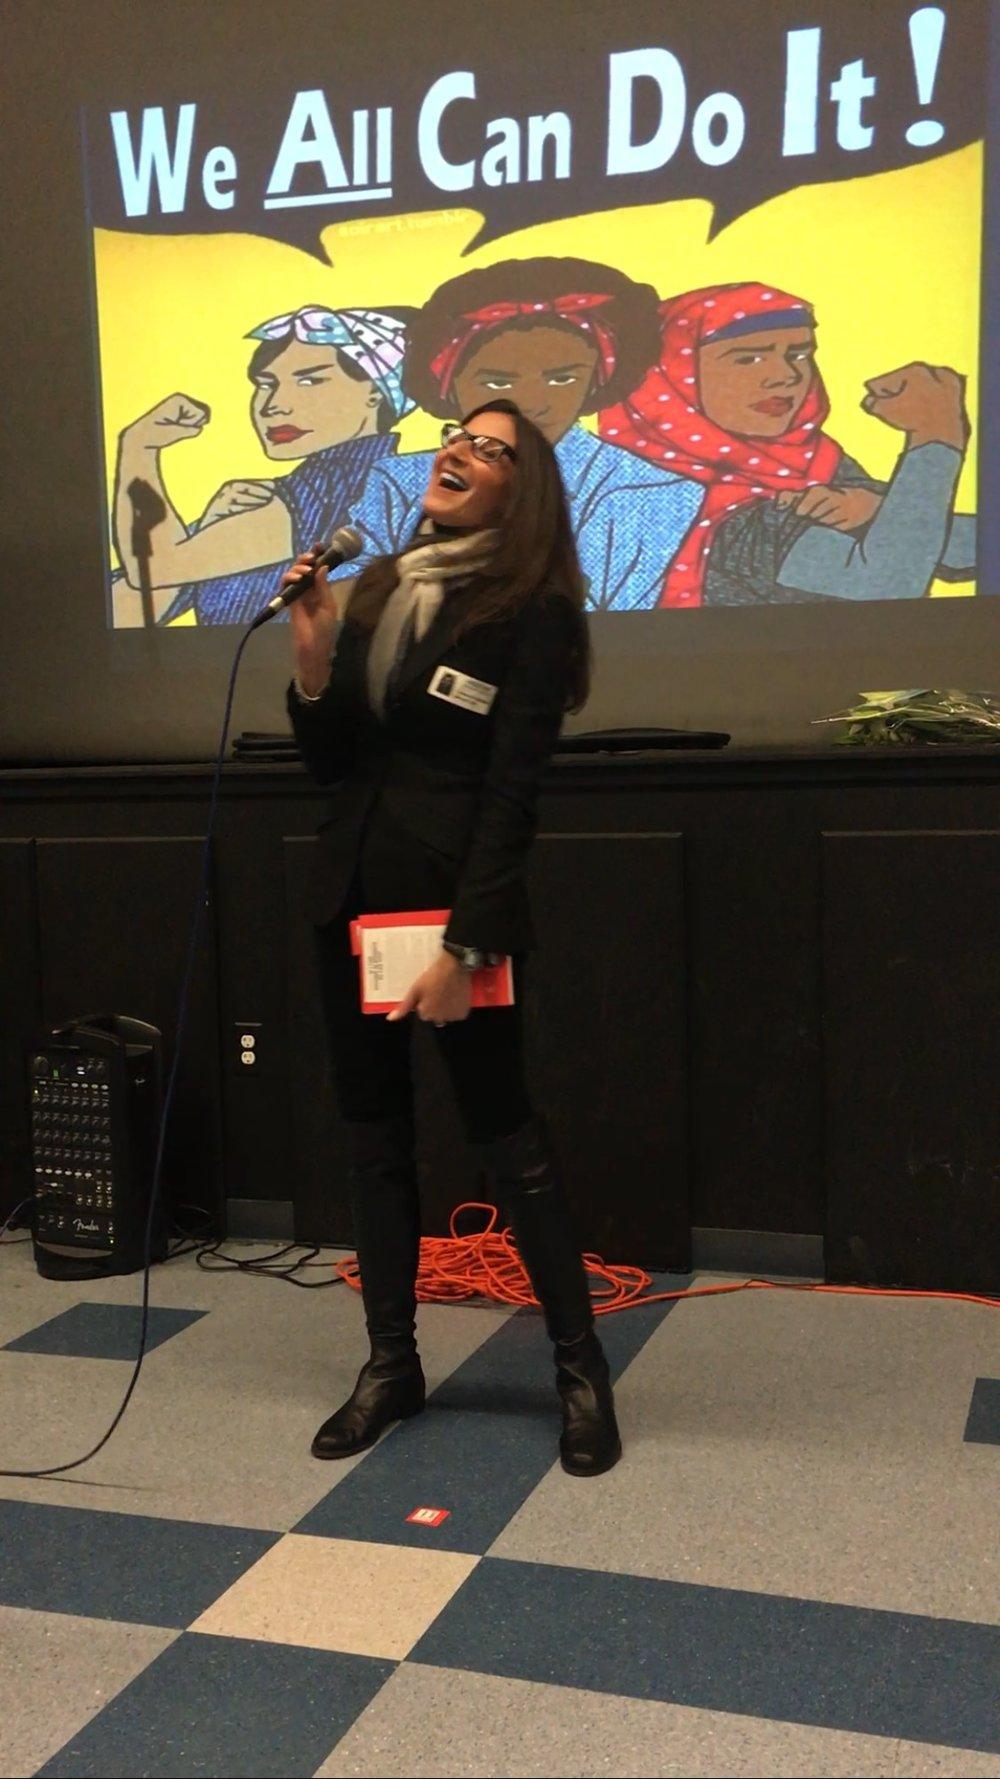 #TamiHolzman Tami Holzman #Keynotespeaker, Keynote Speaker, #emotionalintellegence Emotional Intelligence, #eq #csuite C-Suite #sales Sales #Author #Writer #Speaker, Author, female empowerment, #Business Business #Press Press